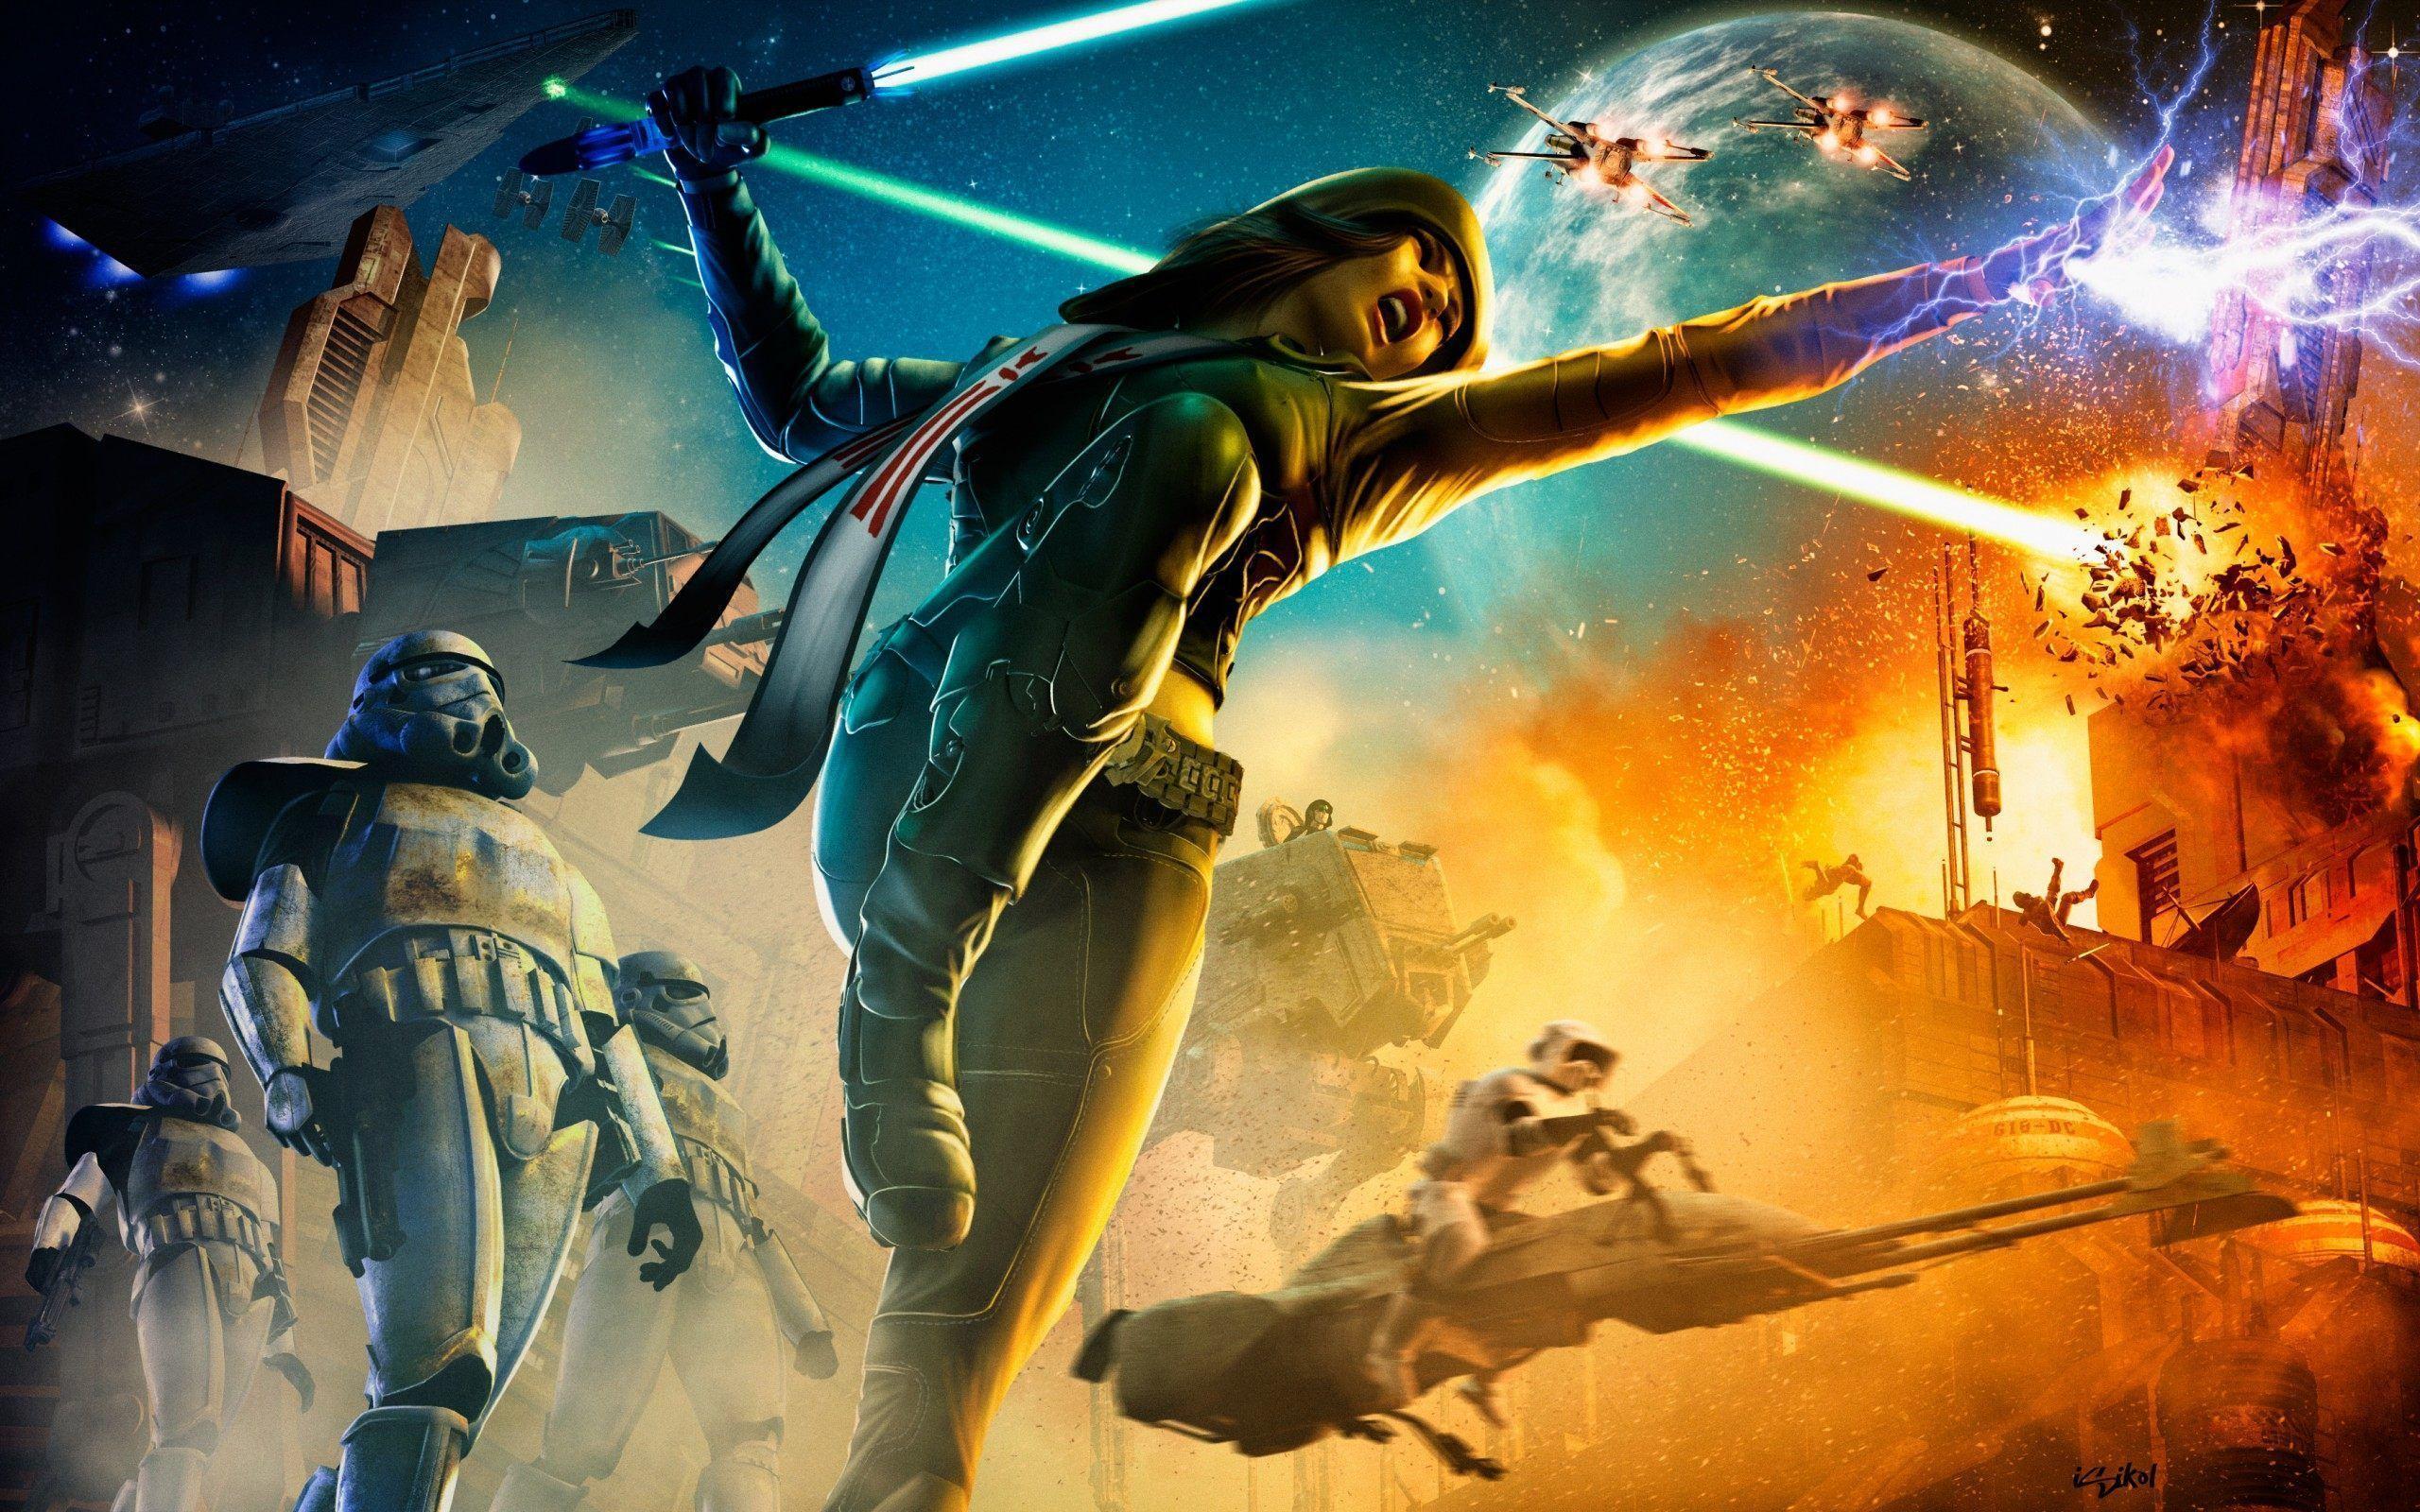 Star Wars Rebels Hd Wallpapers Wallpaper Cave